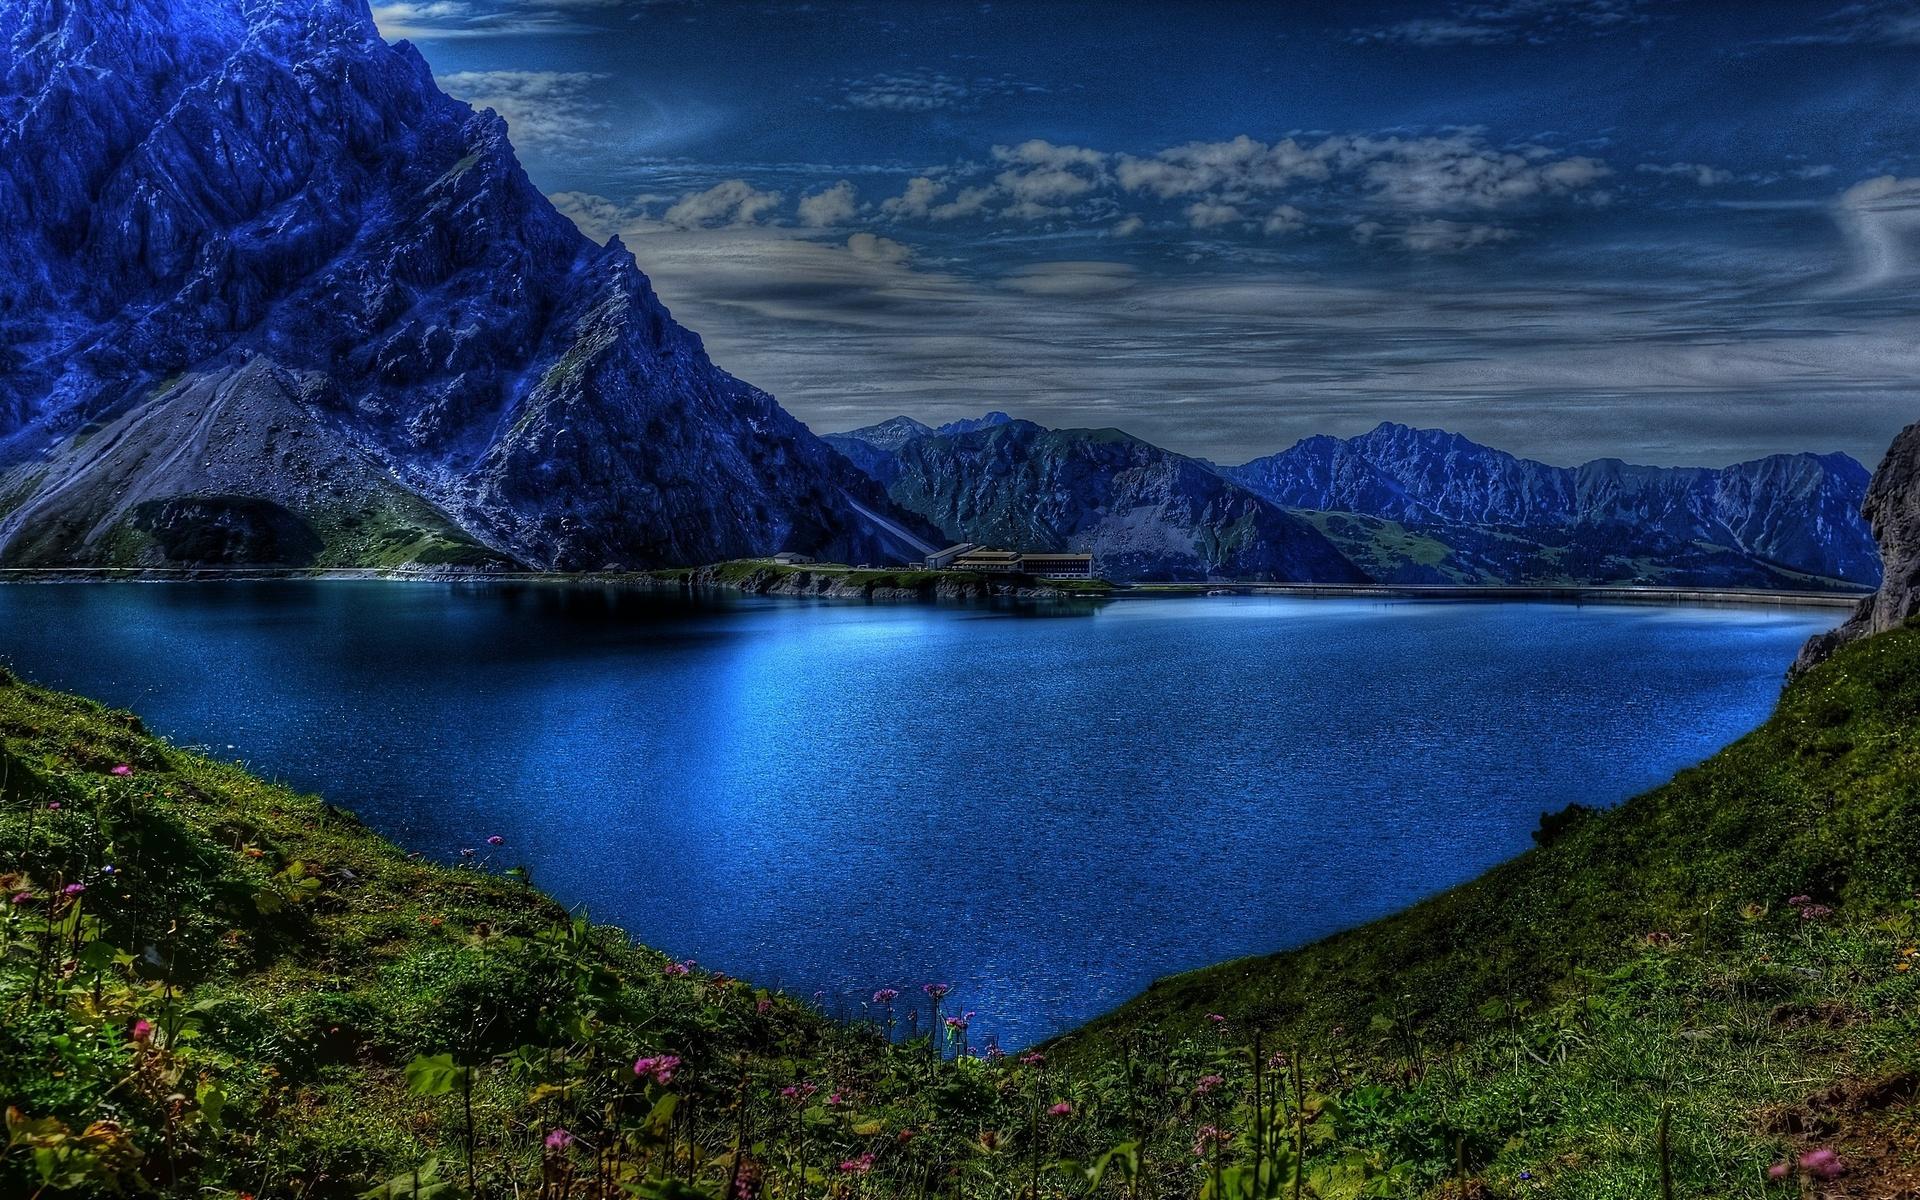 andscape, lake, mountains, природа, пейзаж, горы, озеро, сумерки